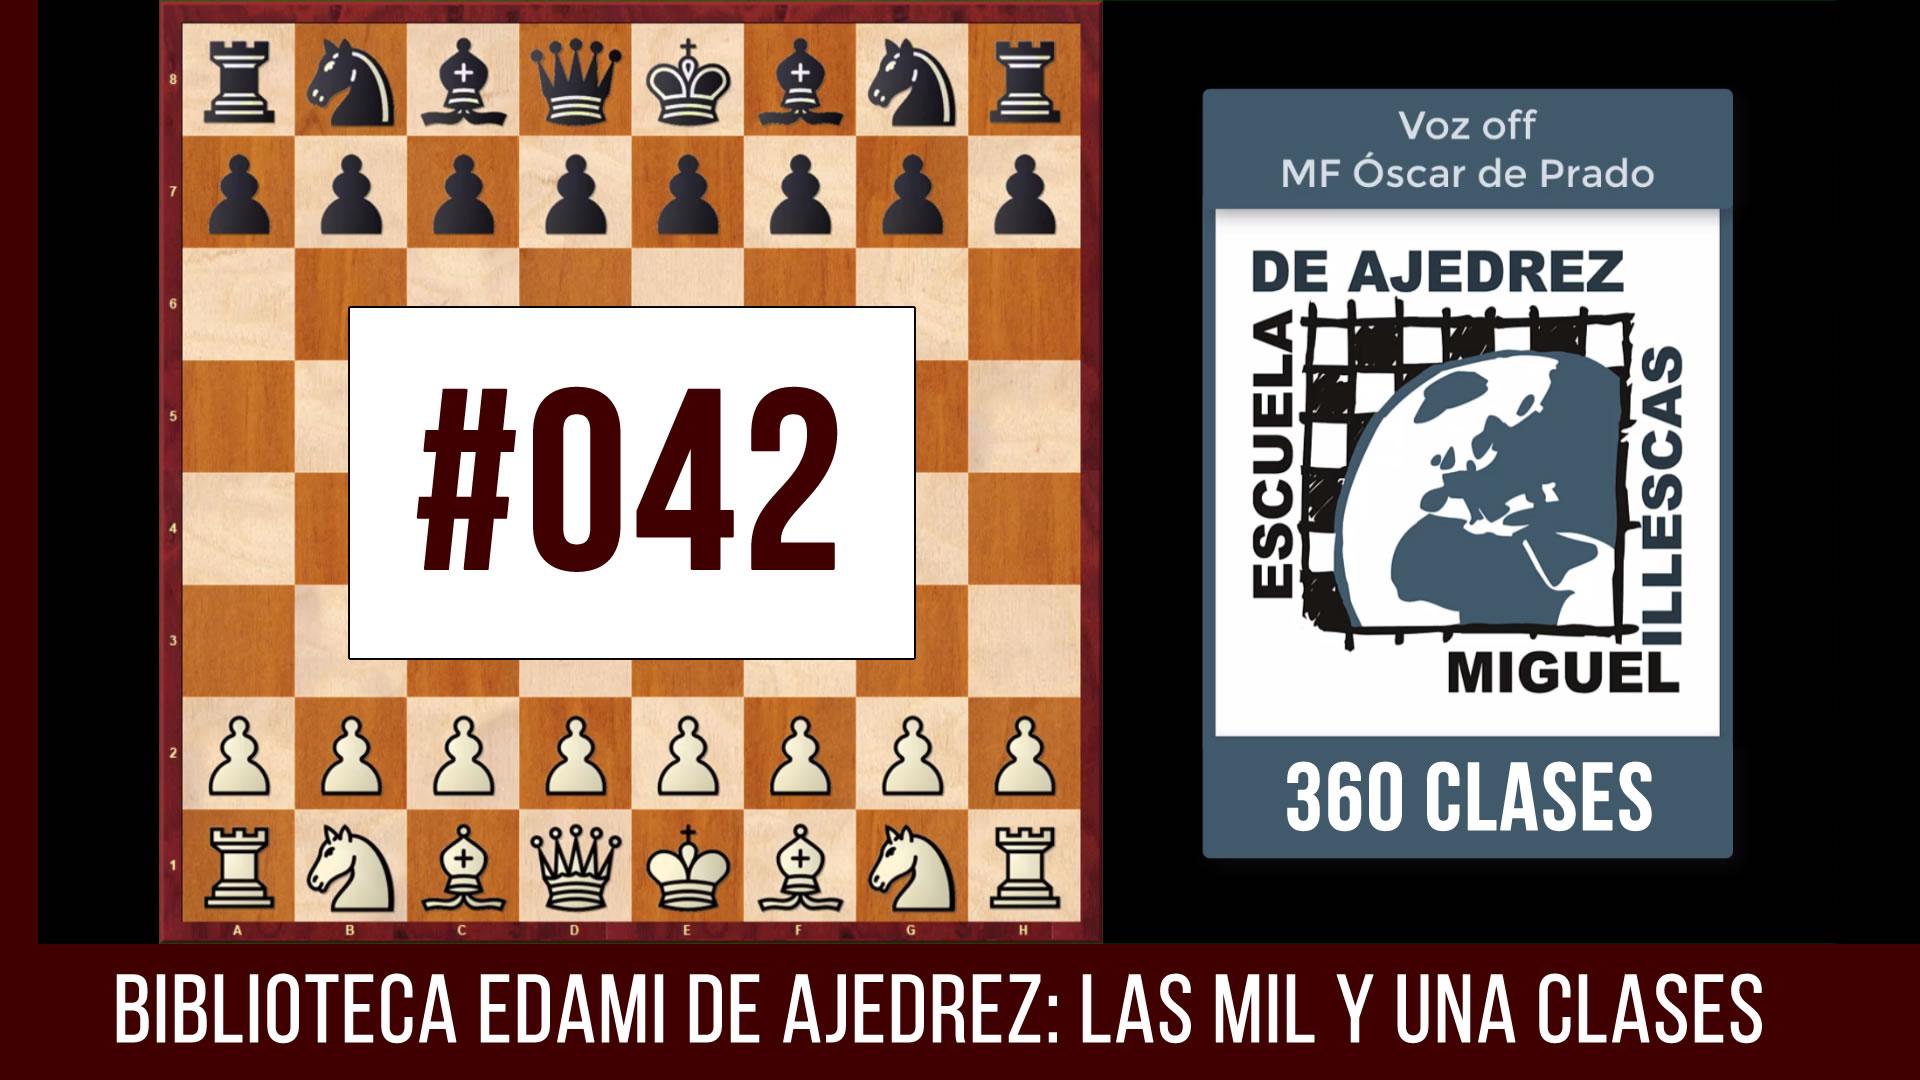 Clases de ajedrez #042 - EDAMI